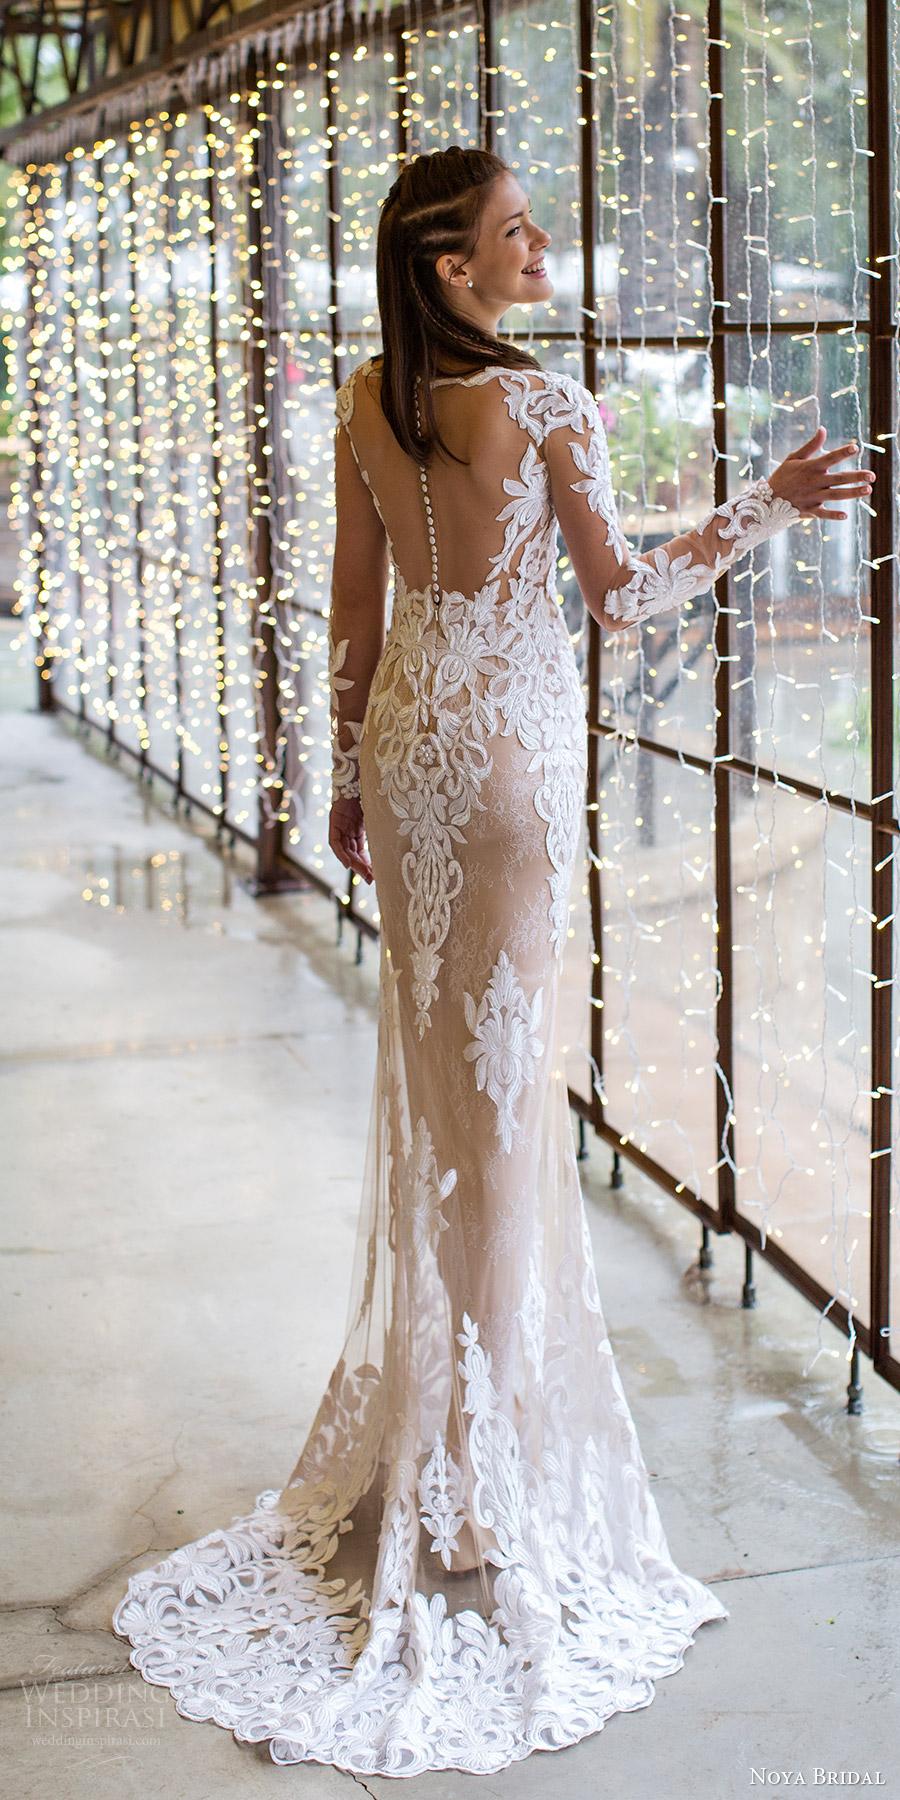 noya bridal 2016 illusion long sleeve scalloped sweetheart illusion jewel sheath wedding dress (1201) bv illusionback train elegant